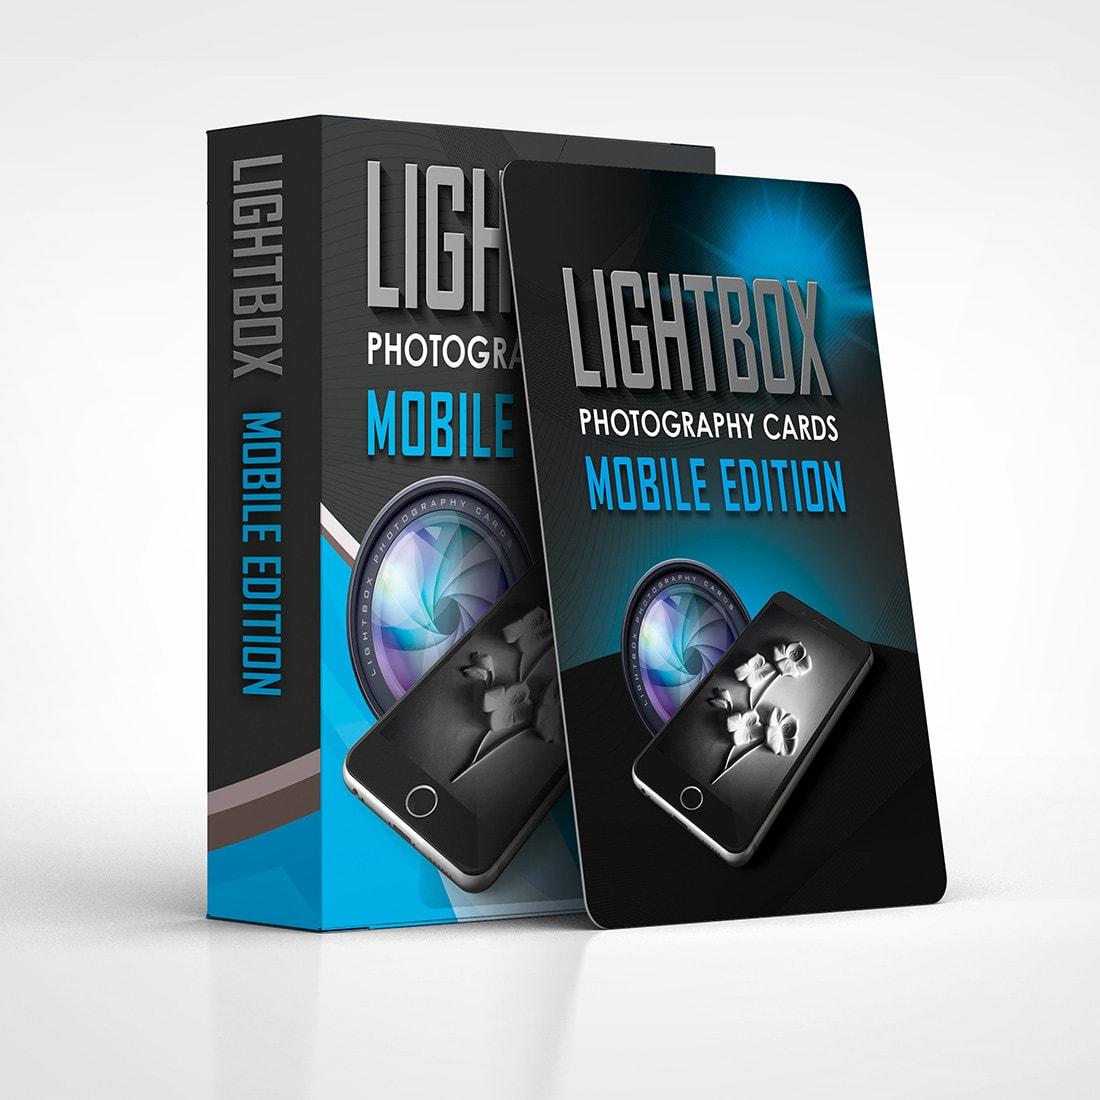 lightboxmobile min image